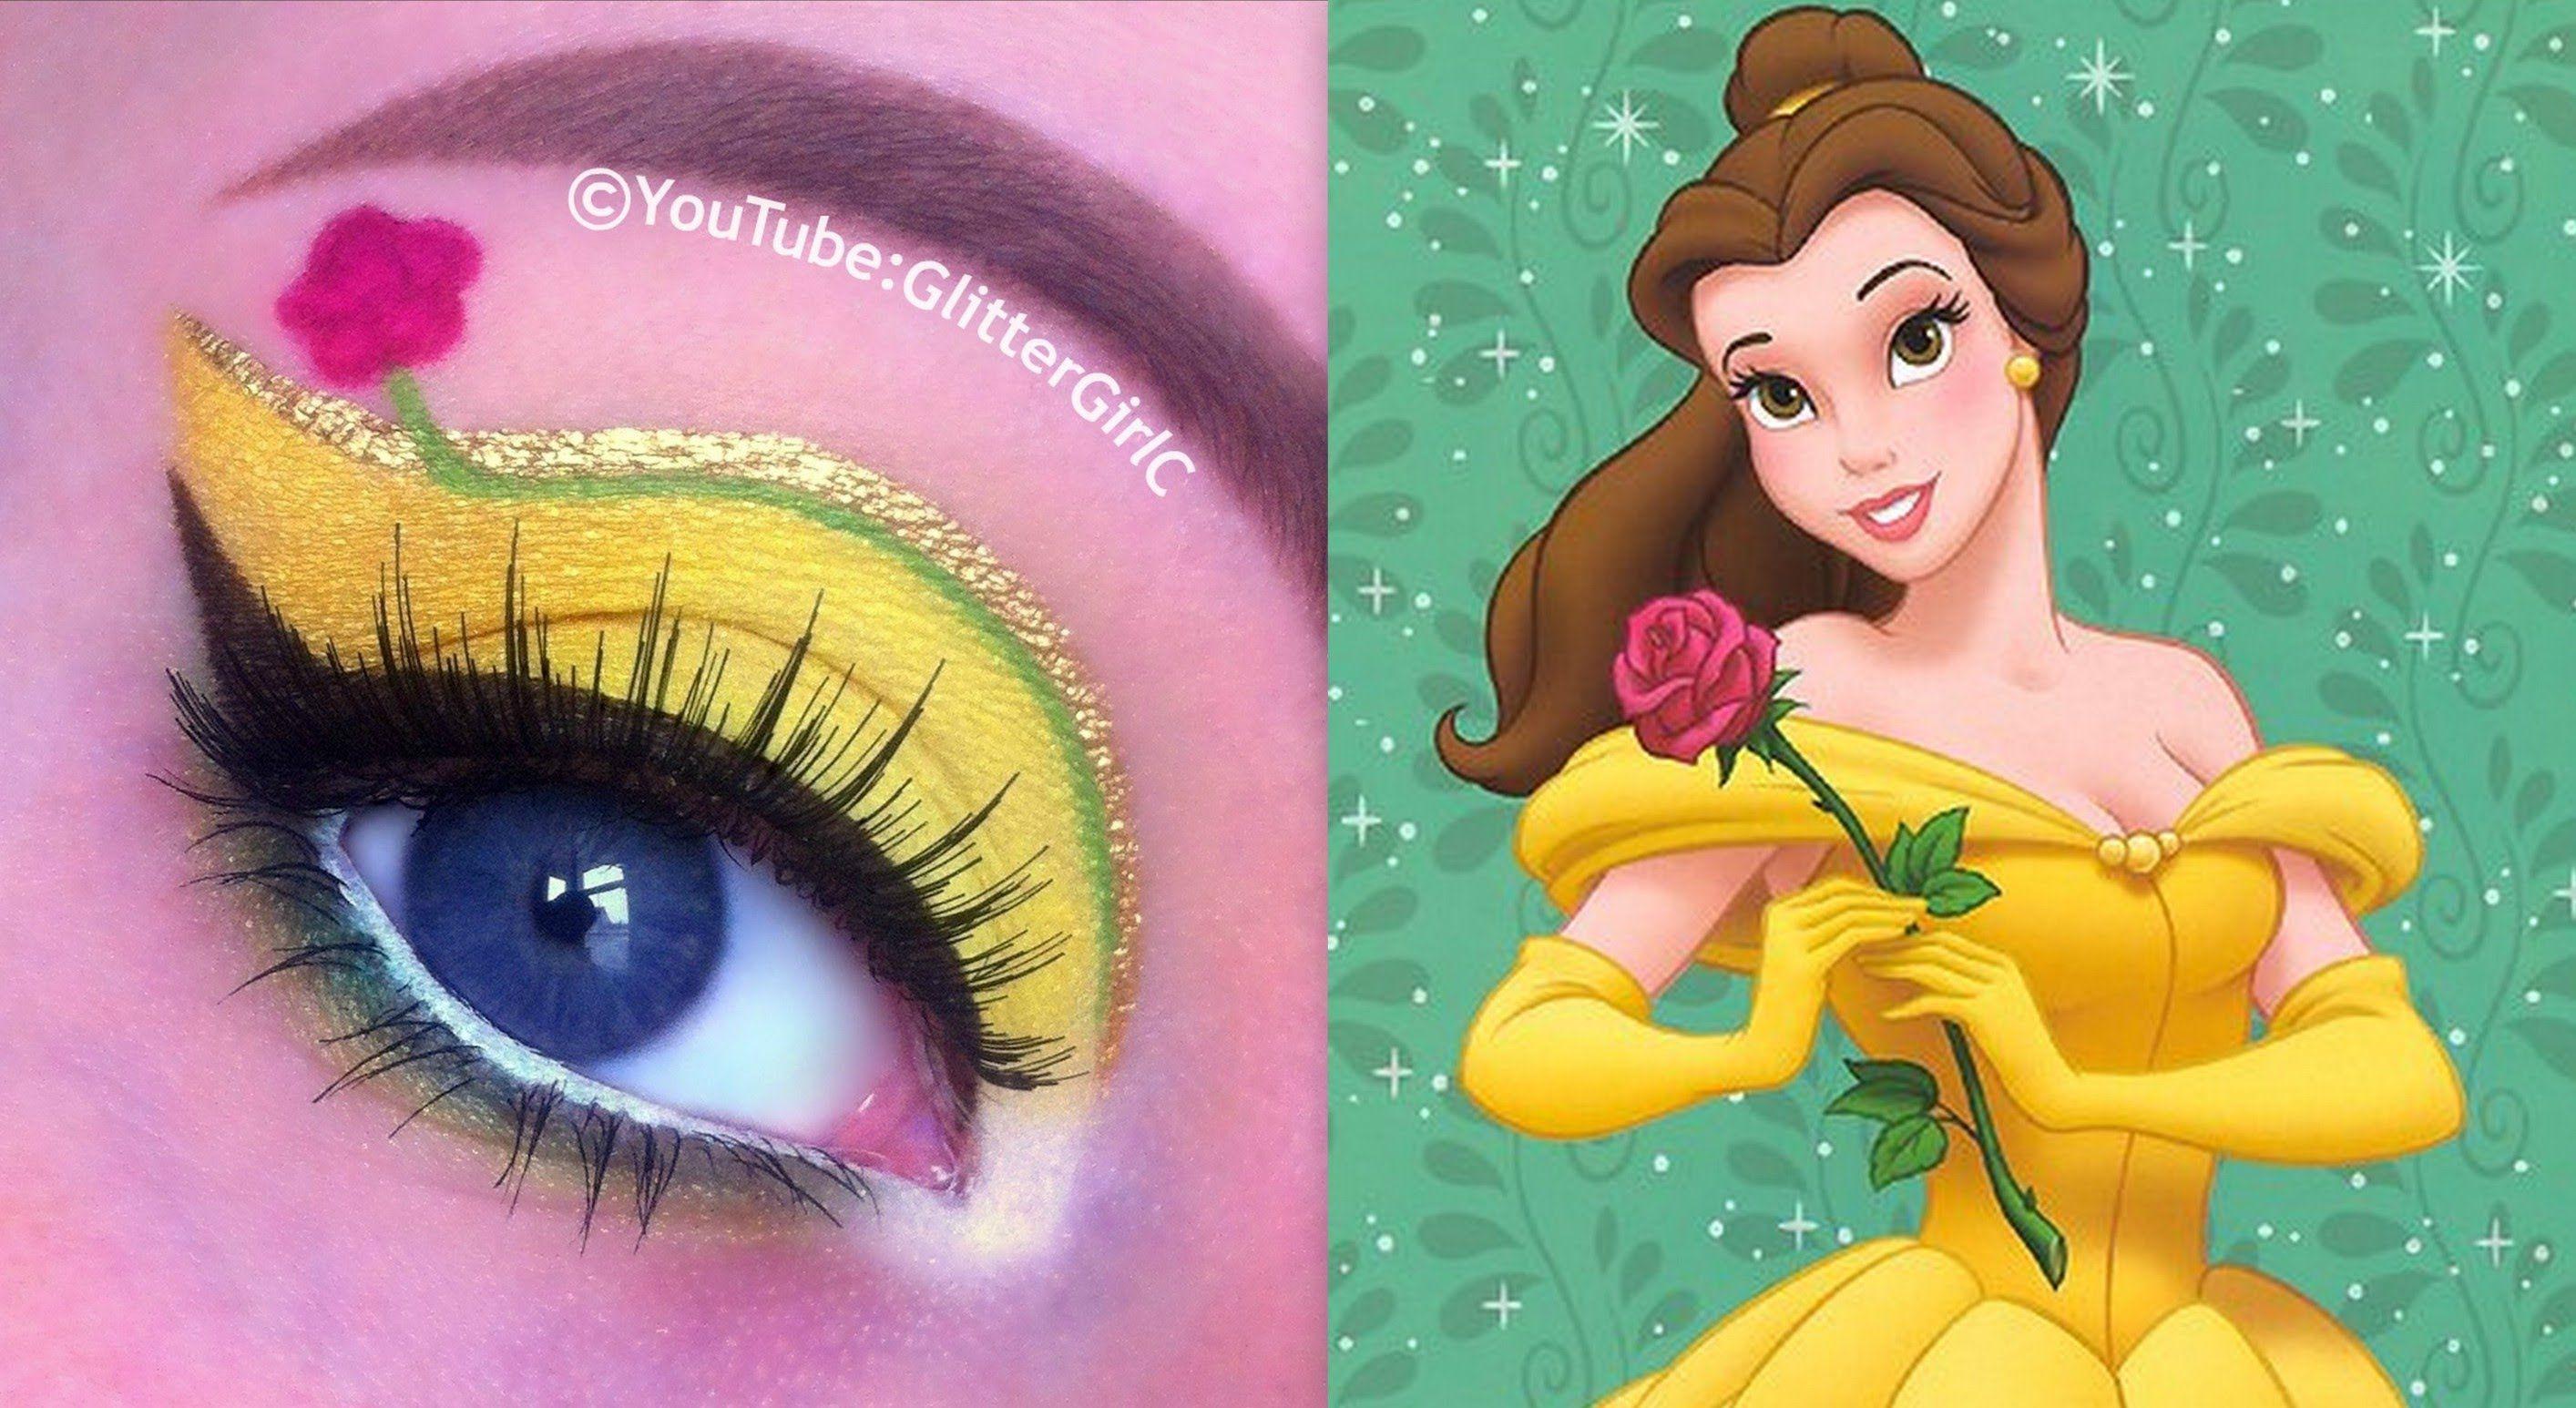 Disney princess belle makeup tutorial youtube channel http disney princess belle makeup tutorial youtube channel httpfull baditri Images